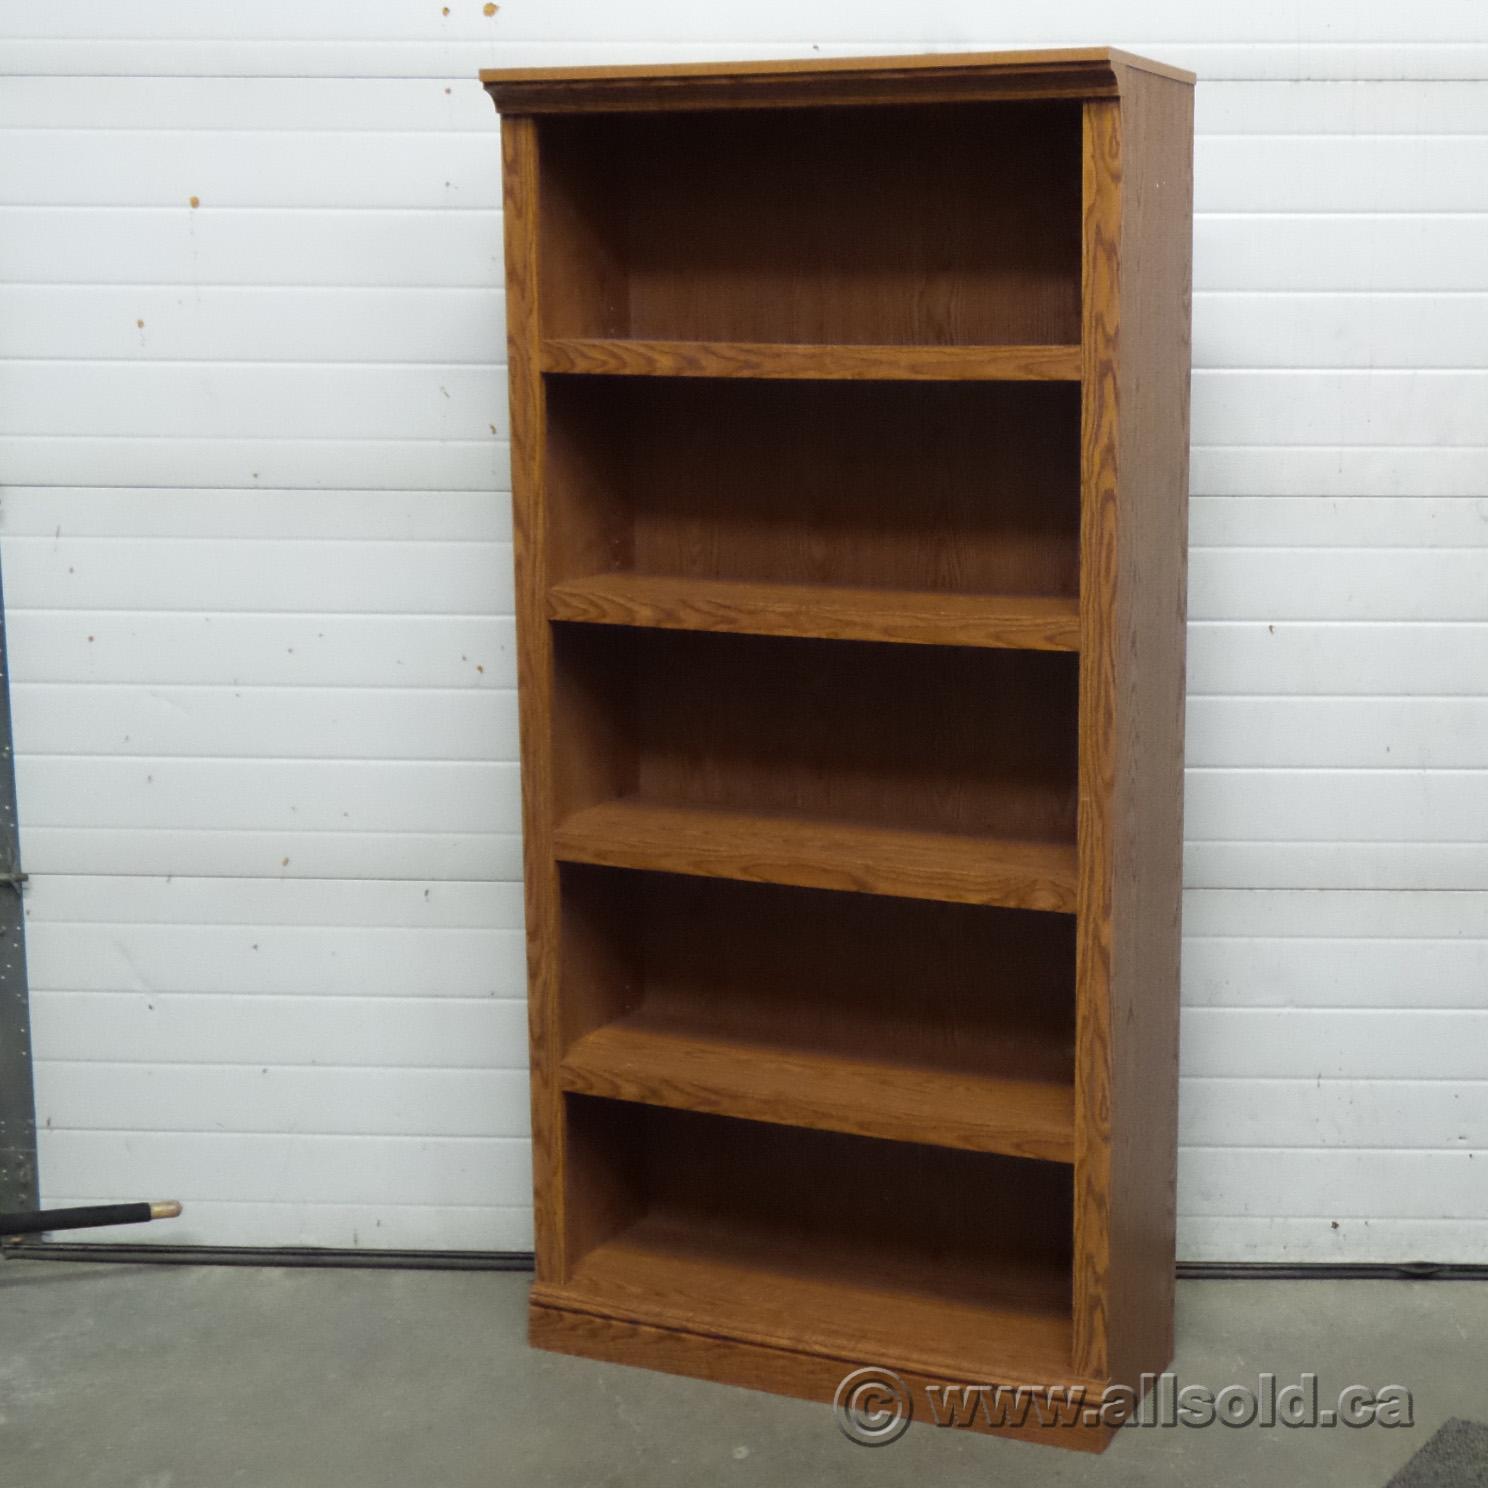 Oak 5 Shelf Adjustable Book Case Shelving w Decorative